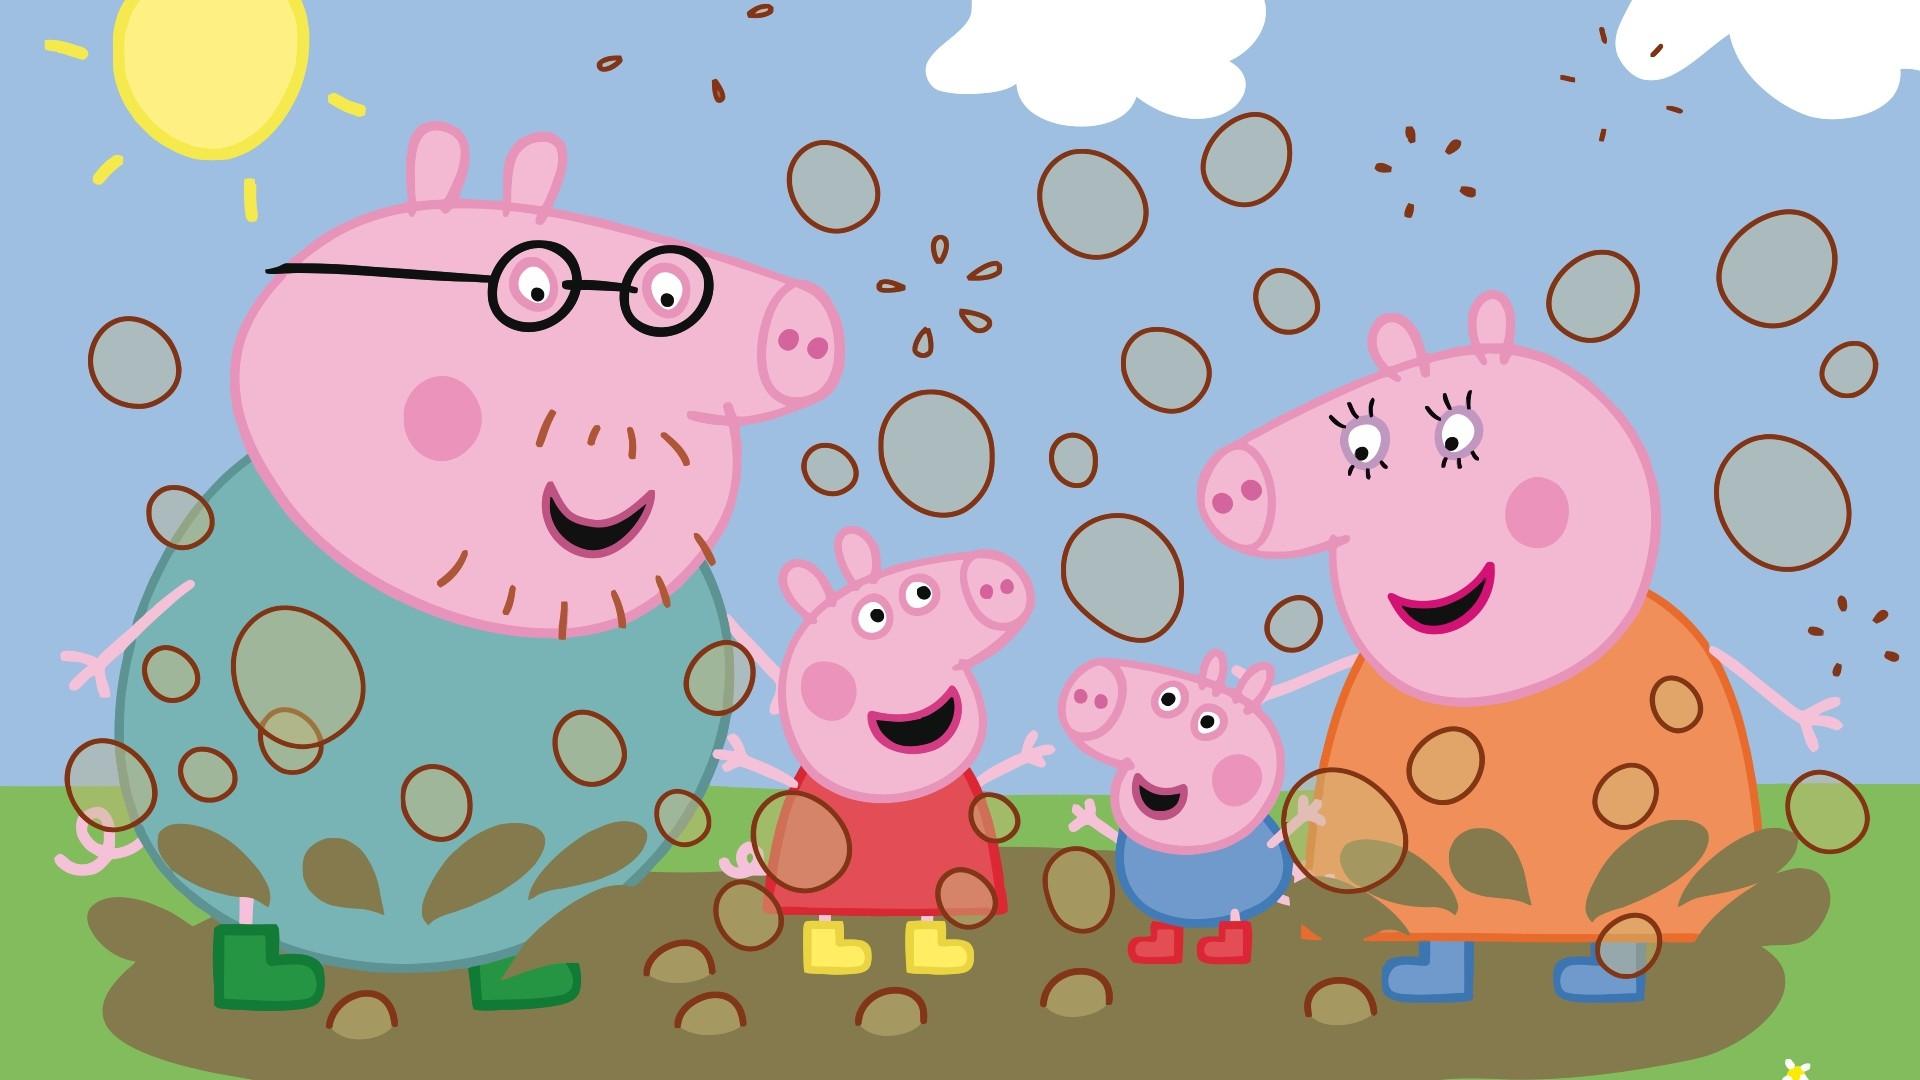 Peppa Pig Wallpaper (67+ images)